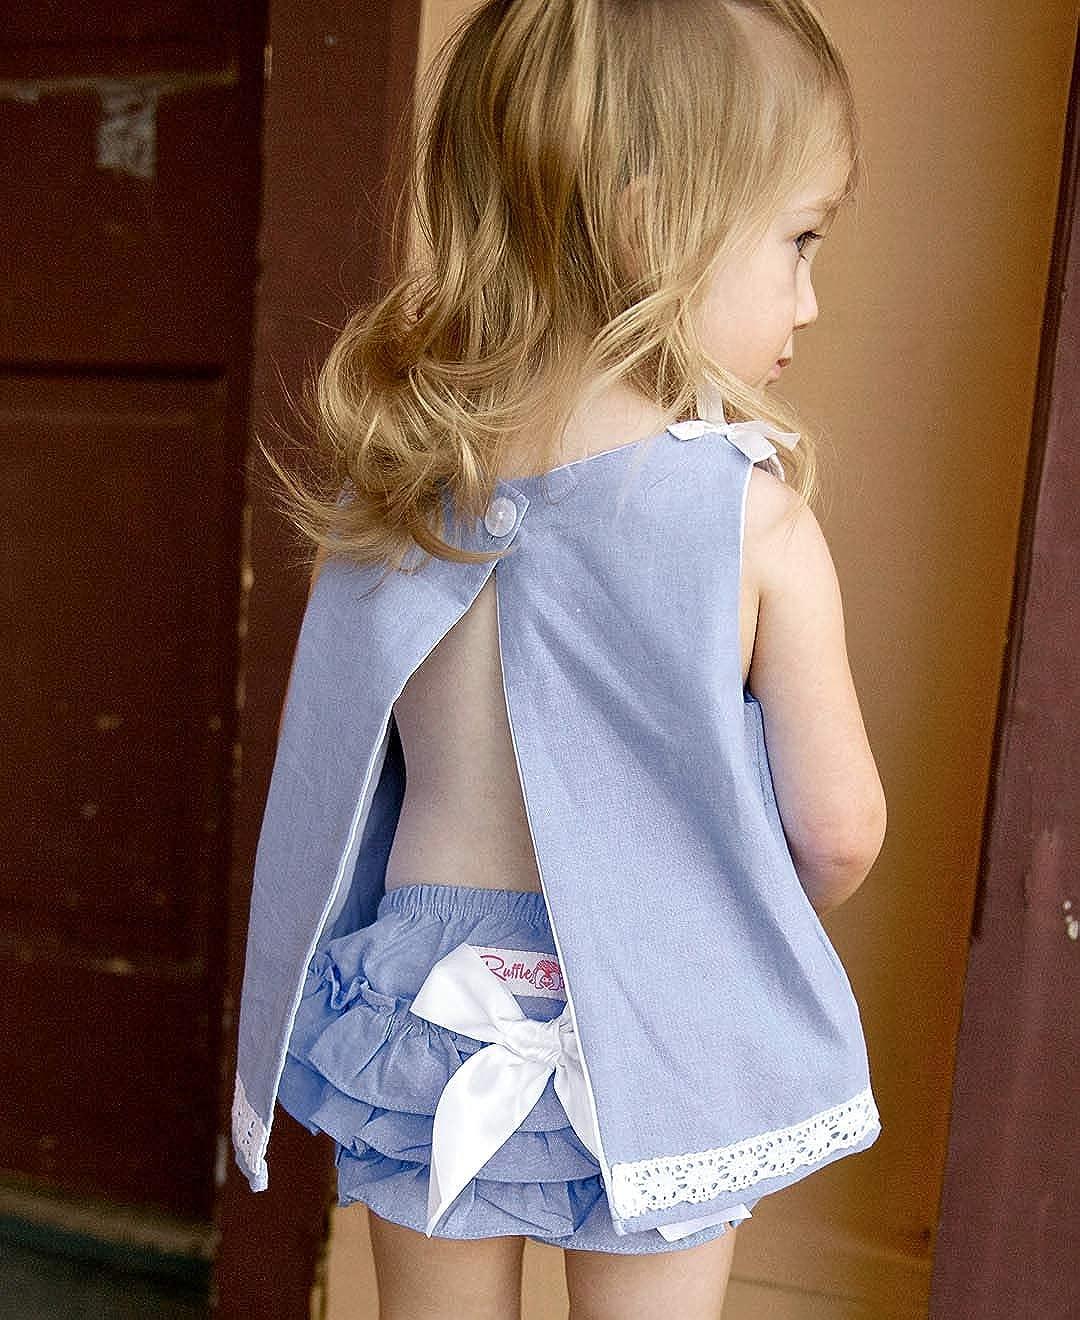 RuffleButts Baby//Toddler Girls Chambray Bloomer w//Bow RBWYYXX-CHAM-SC-BABY